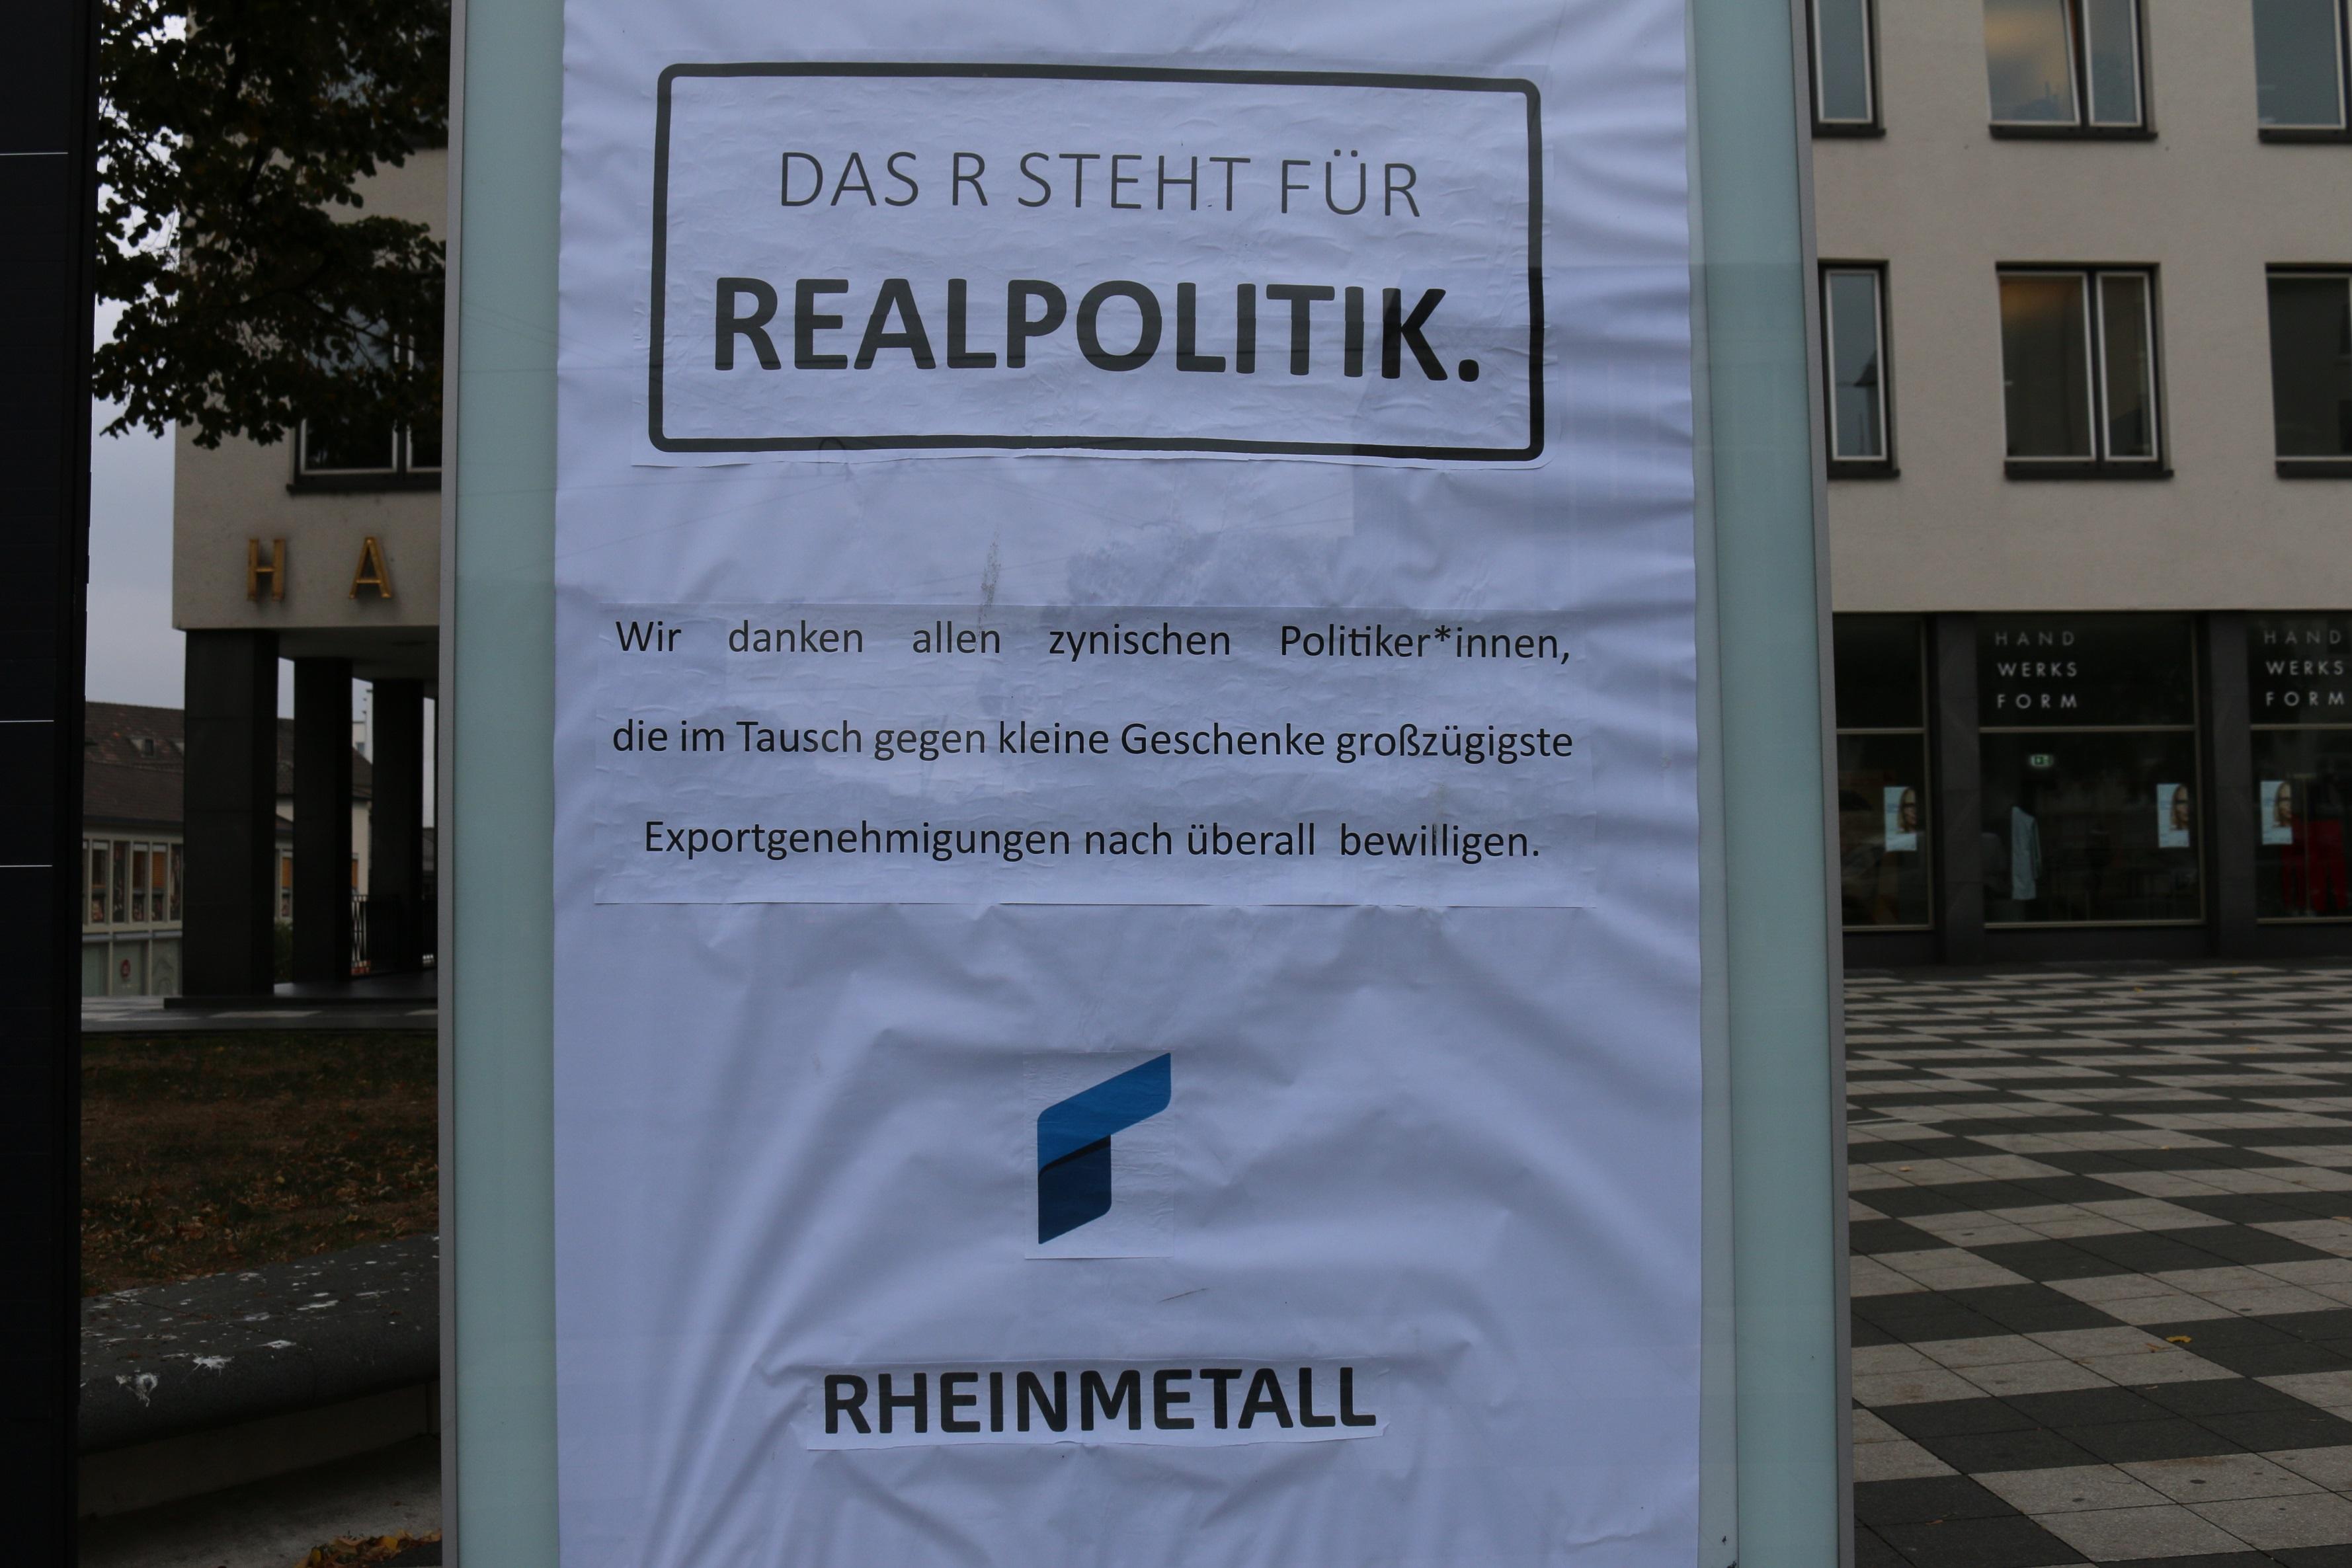 Adbusting gegen Rheinmetall in Kassel